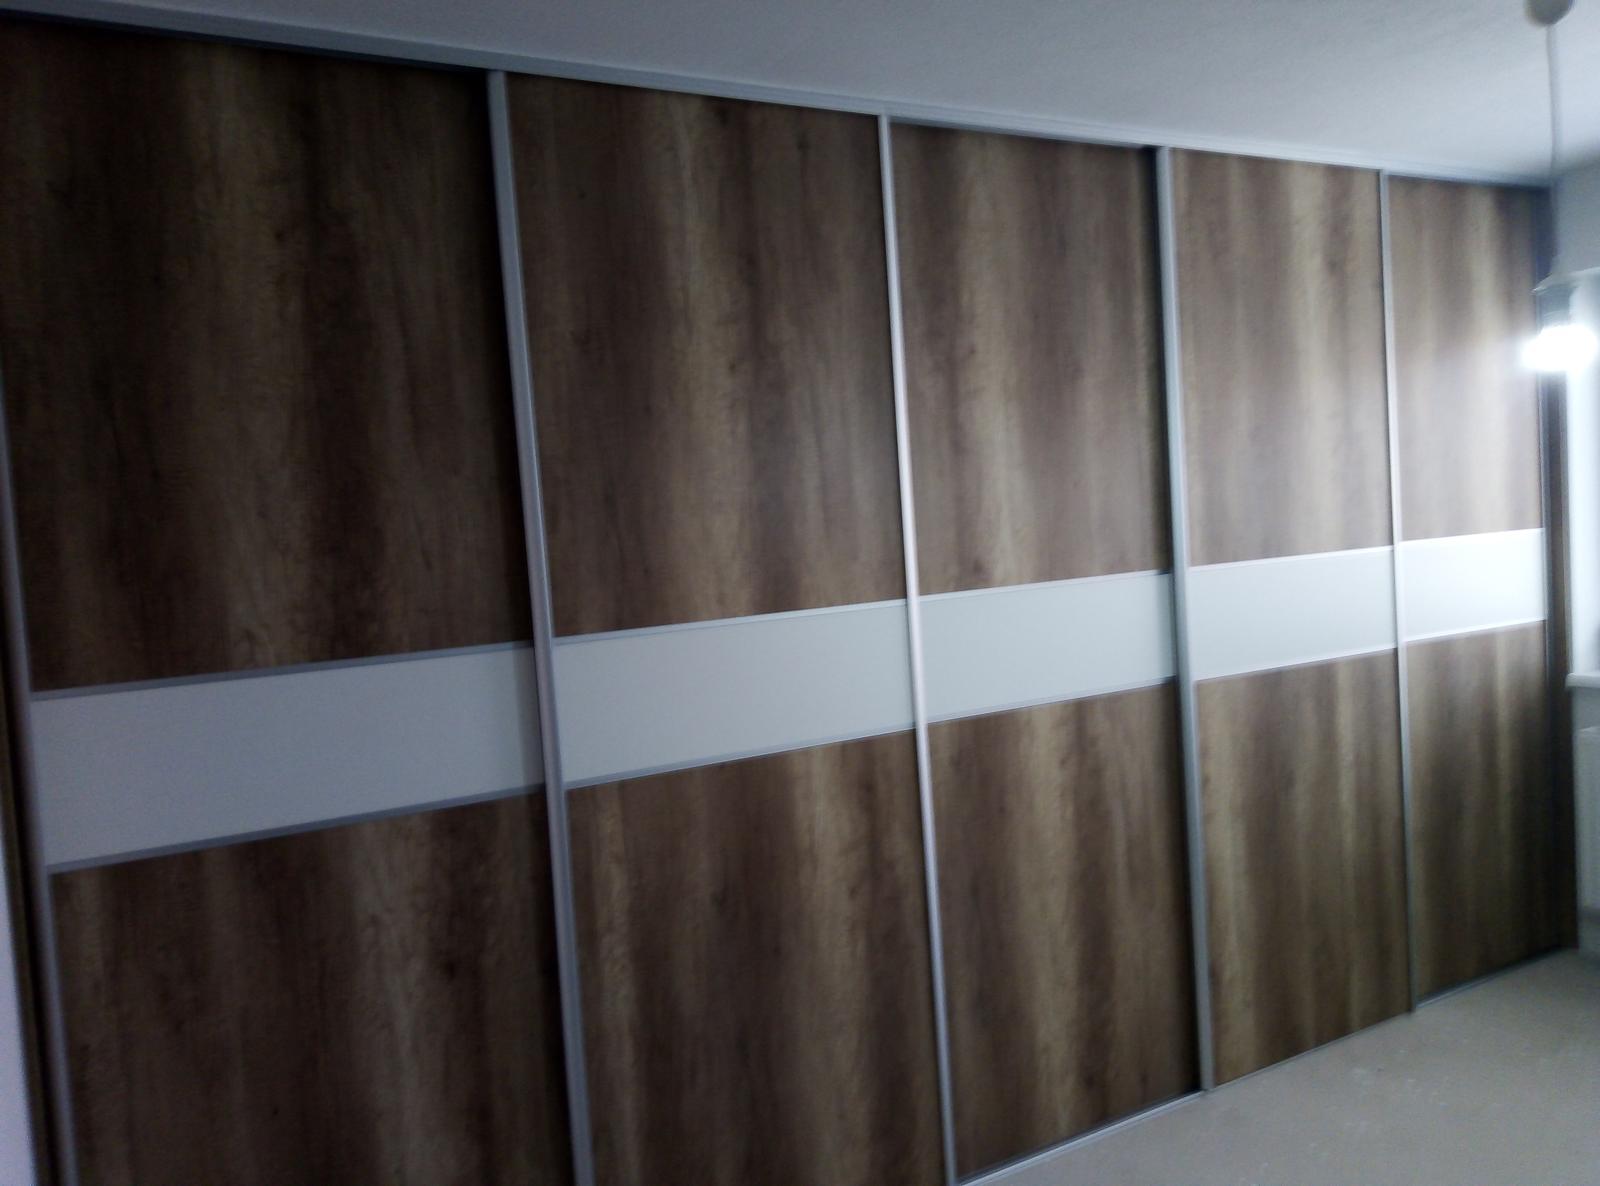 Vstavané skrine Martin Benko Bošany - Obrázok č. 64